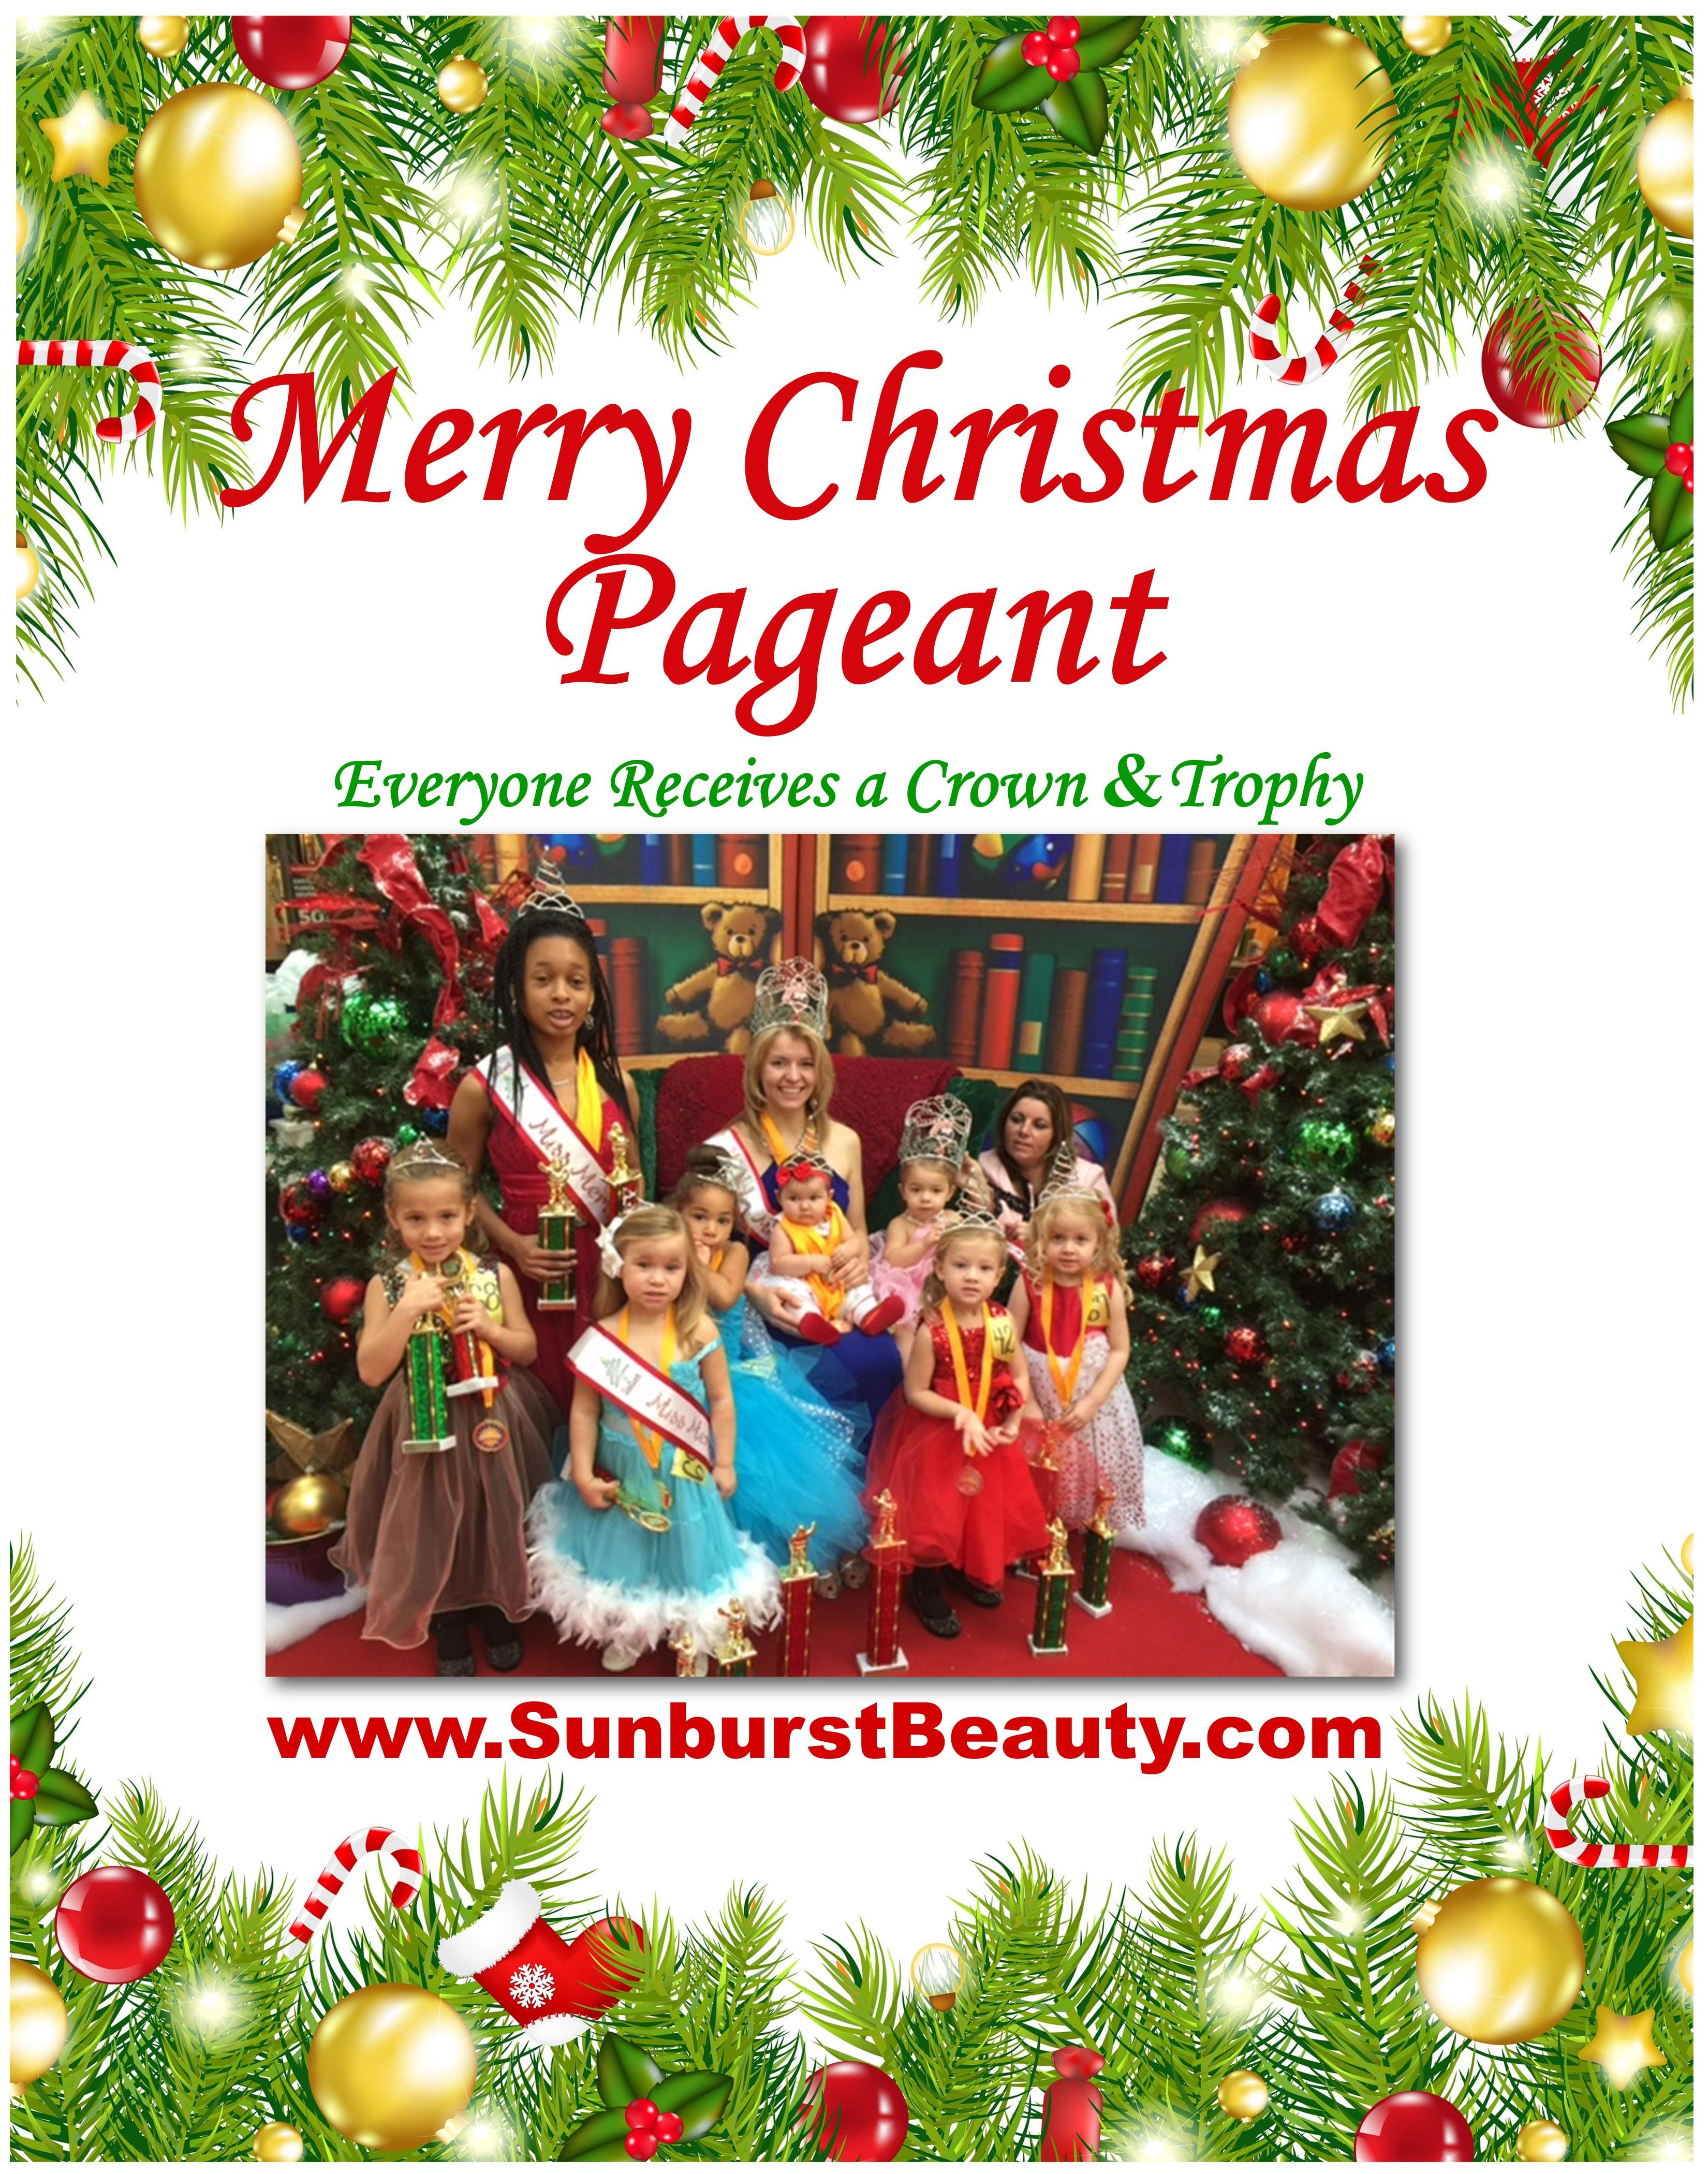 Sunburst Beauty Pageant